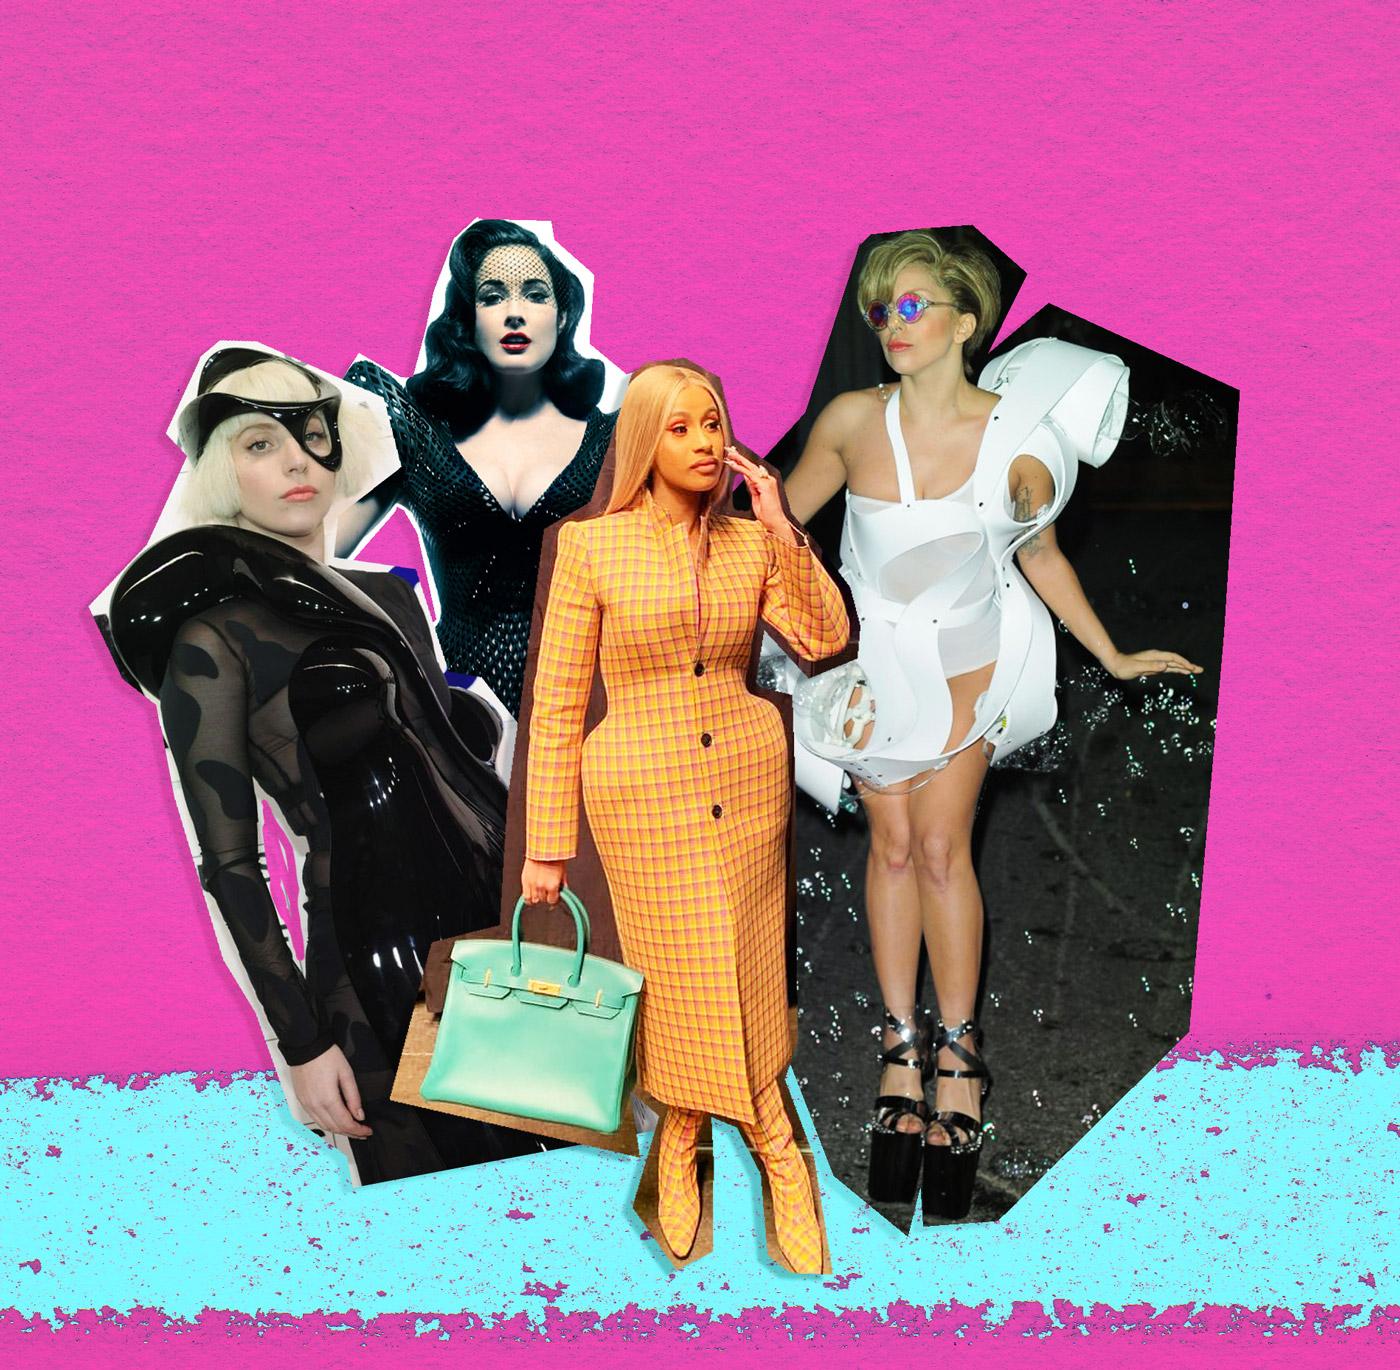 De gauche à droite, Lady Gaga, Dita Von Teese, Cardi B et, à nouveau, Lady Gaga